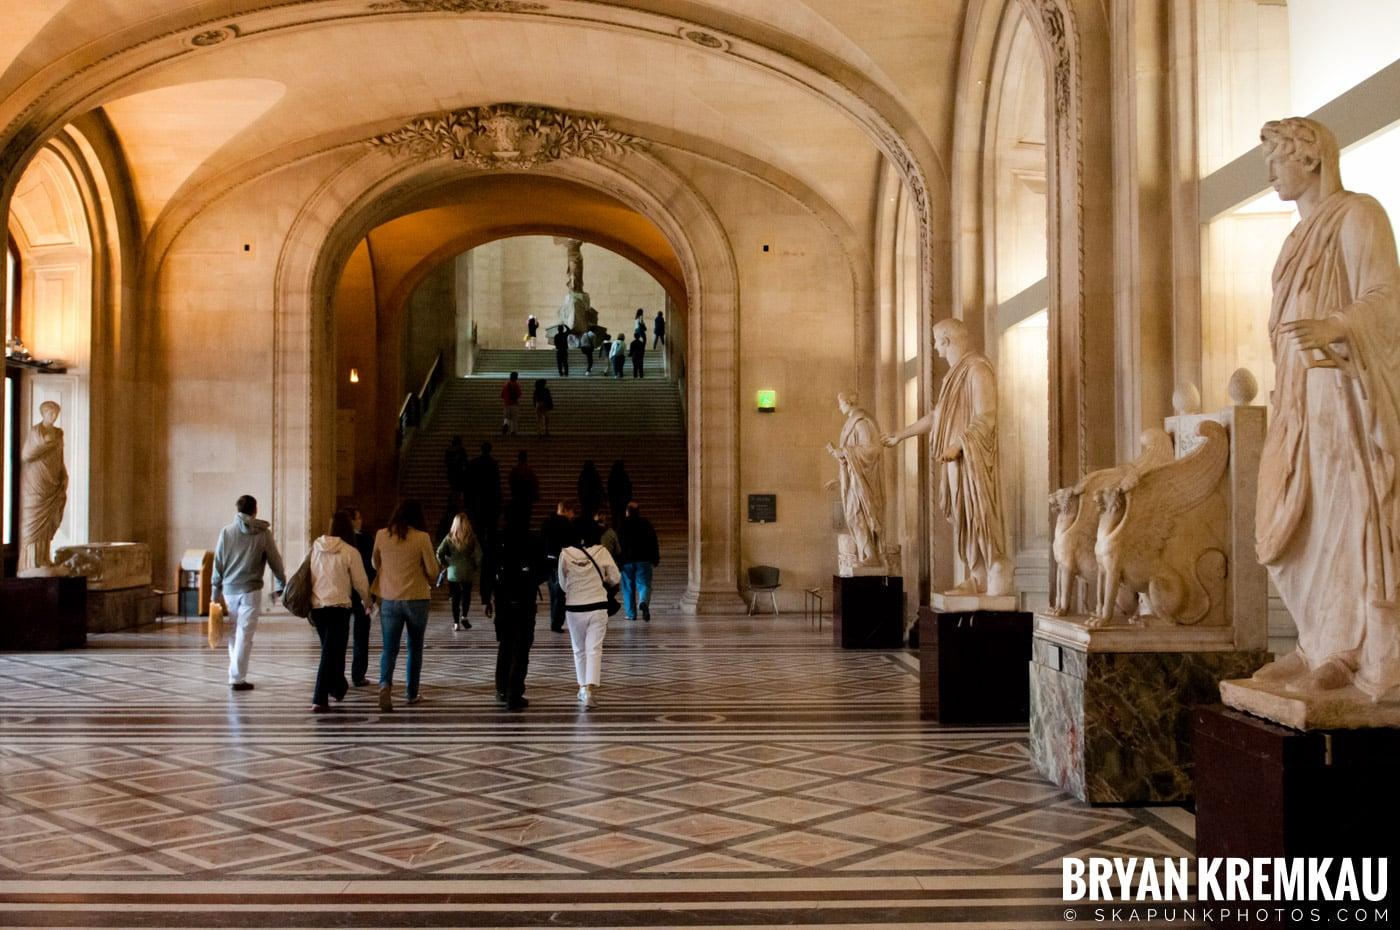 Paris, France Honeymoon - Day 3 - 7.20.11 (101)